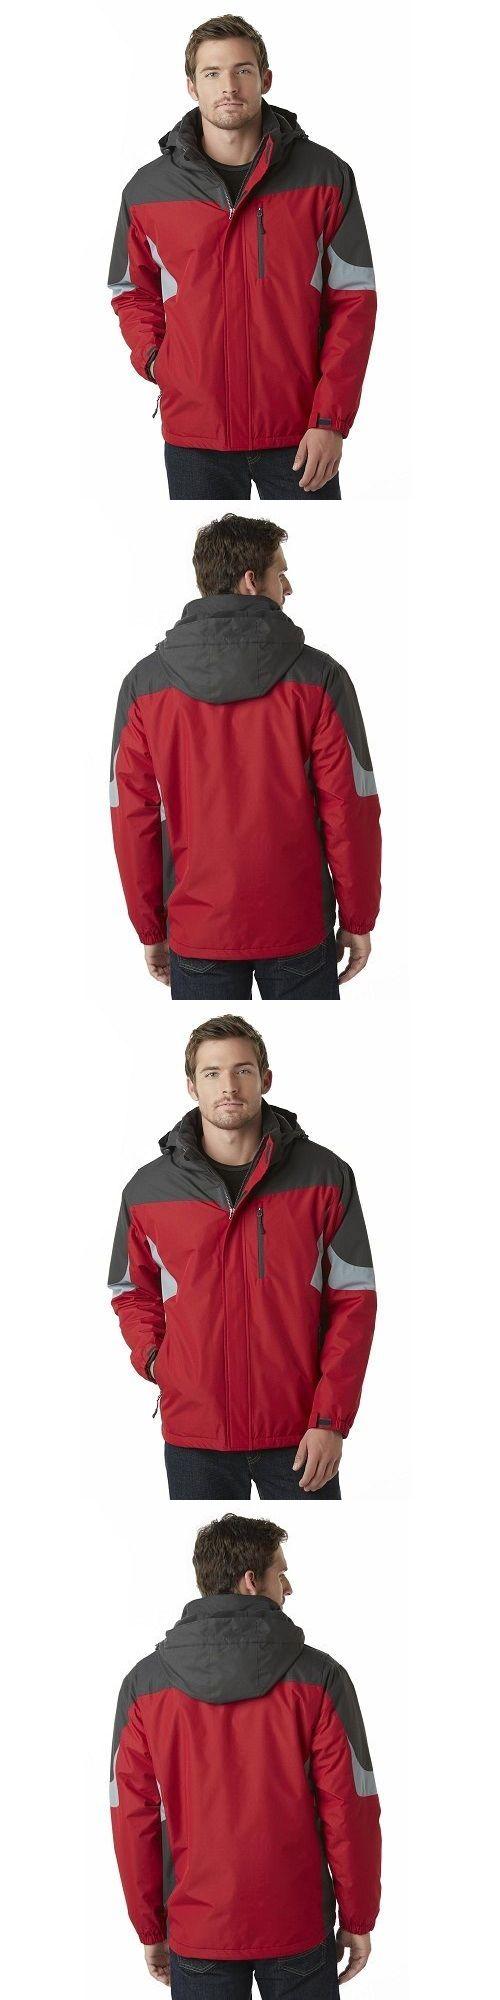 Men Coats And Jackets: Mens Fleece Lining Jacket Coat Snowboard Hooded Winter Snow Warm Zip Size New BUY IT NOW ONLY: $48.95